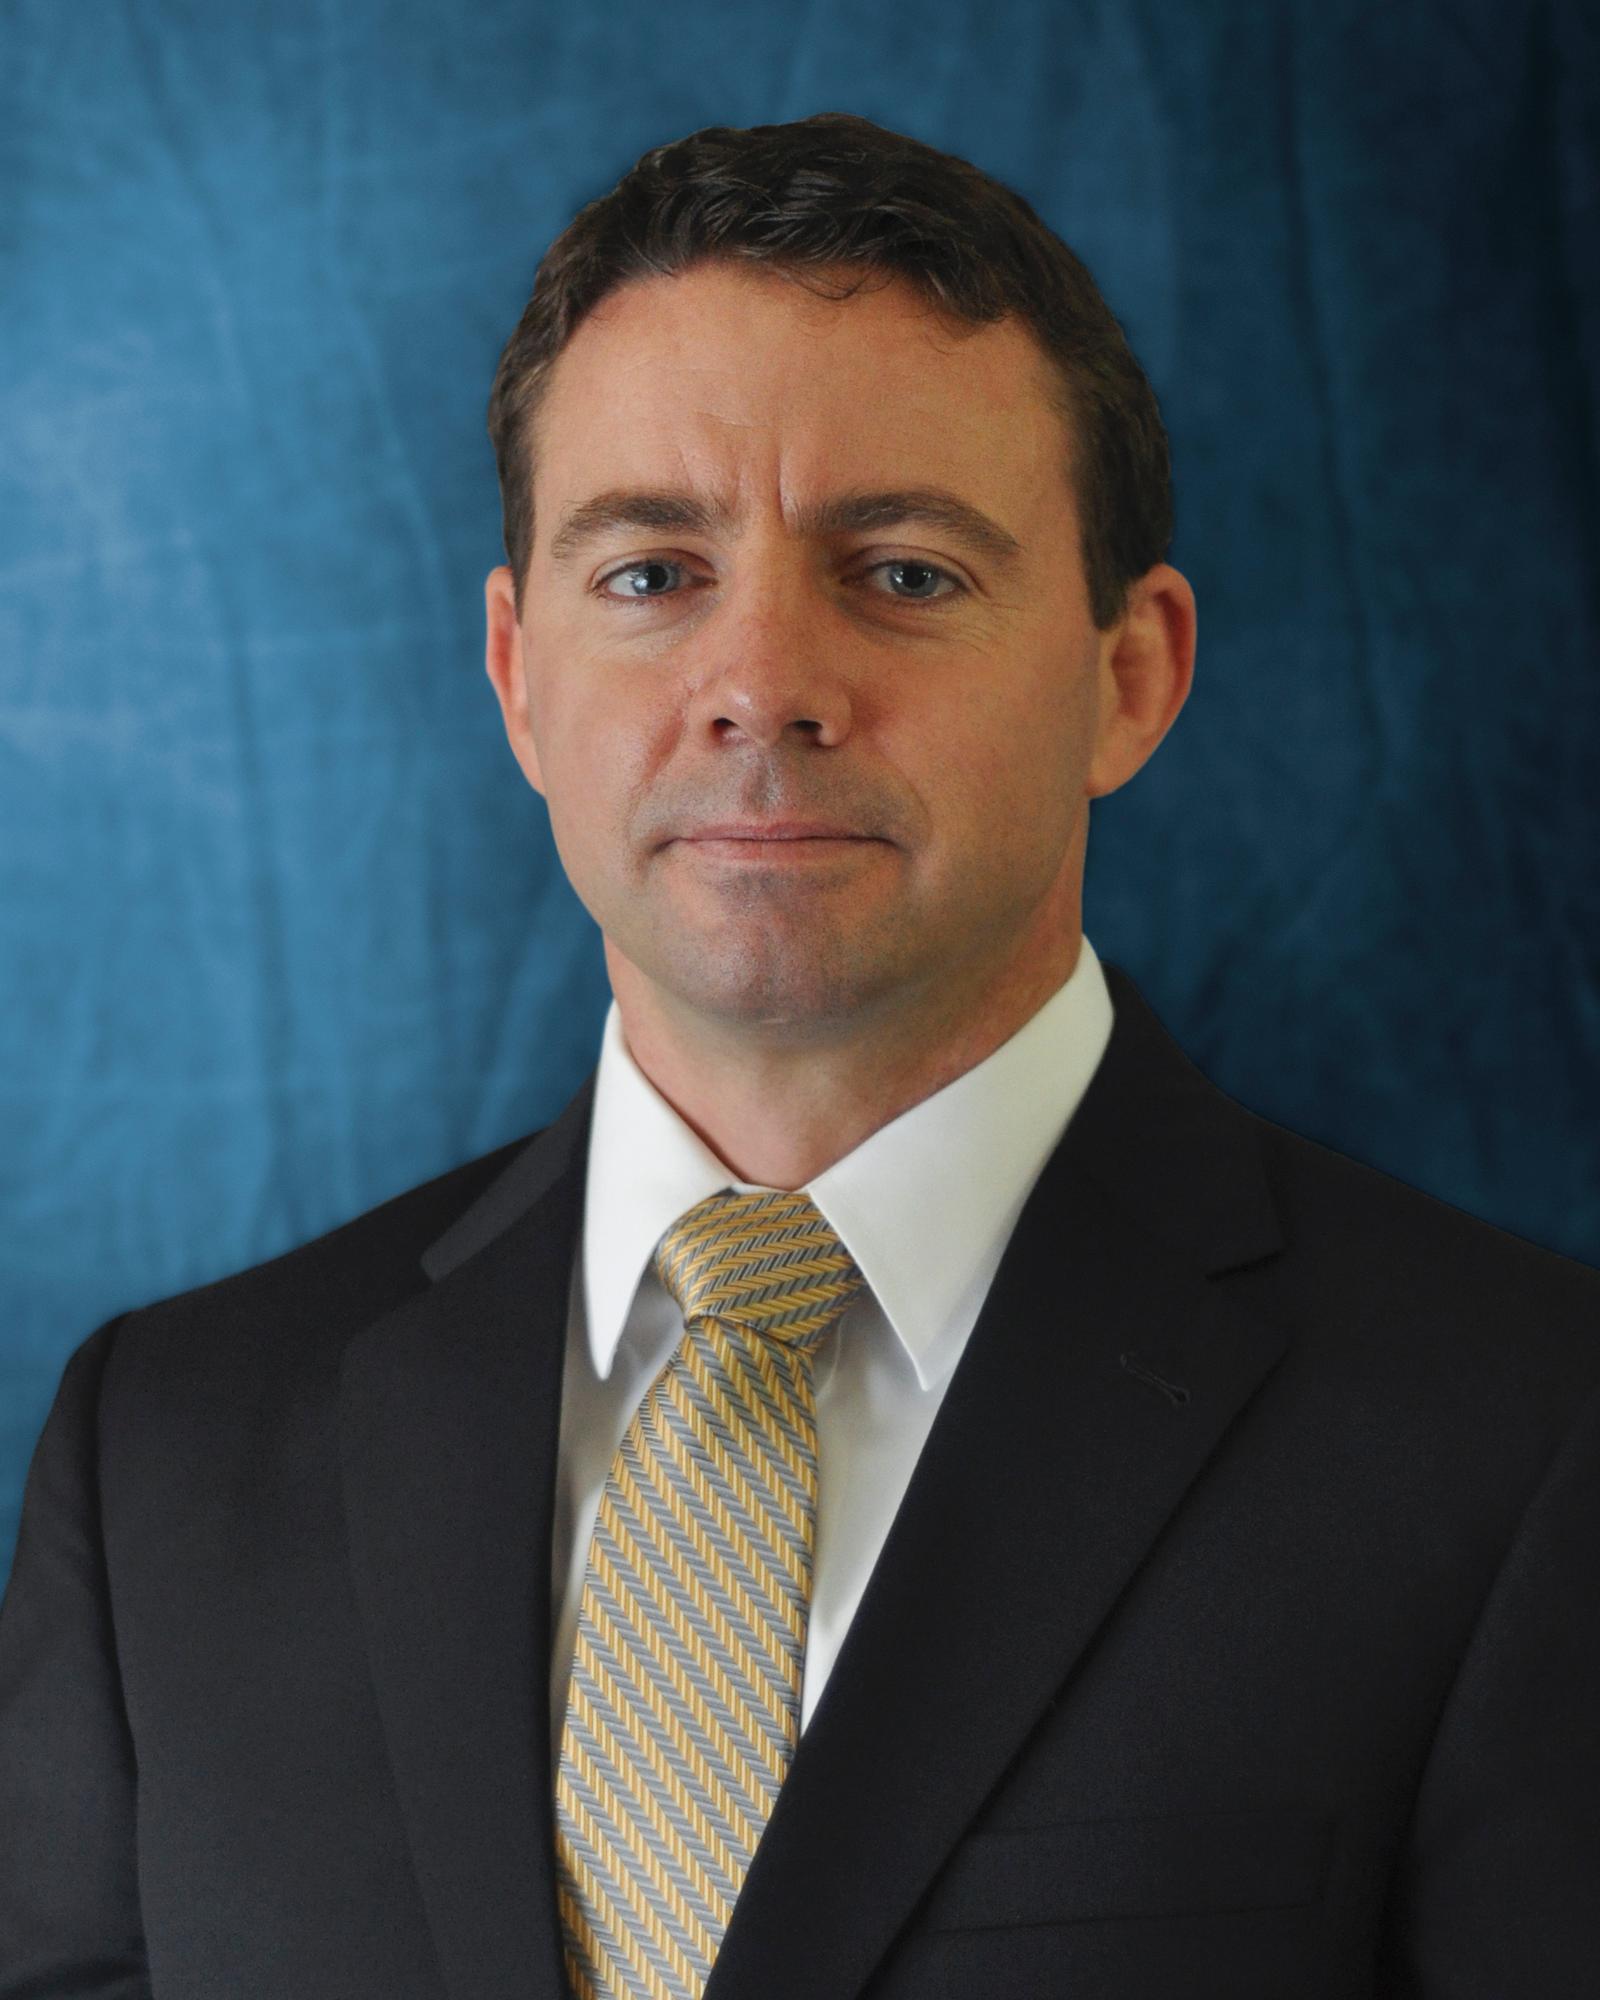 JEFFREY O NEILL  New York Life Associate Partner